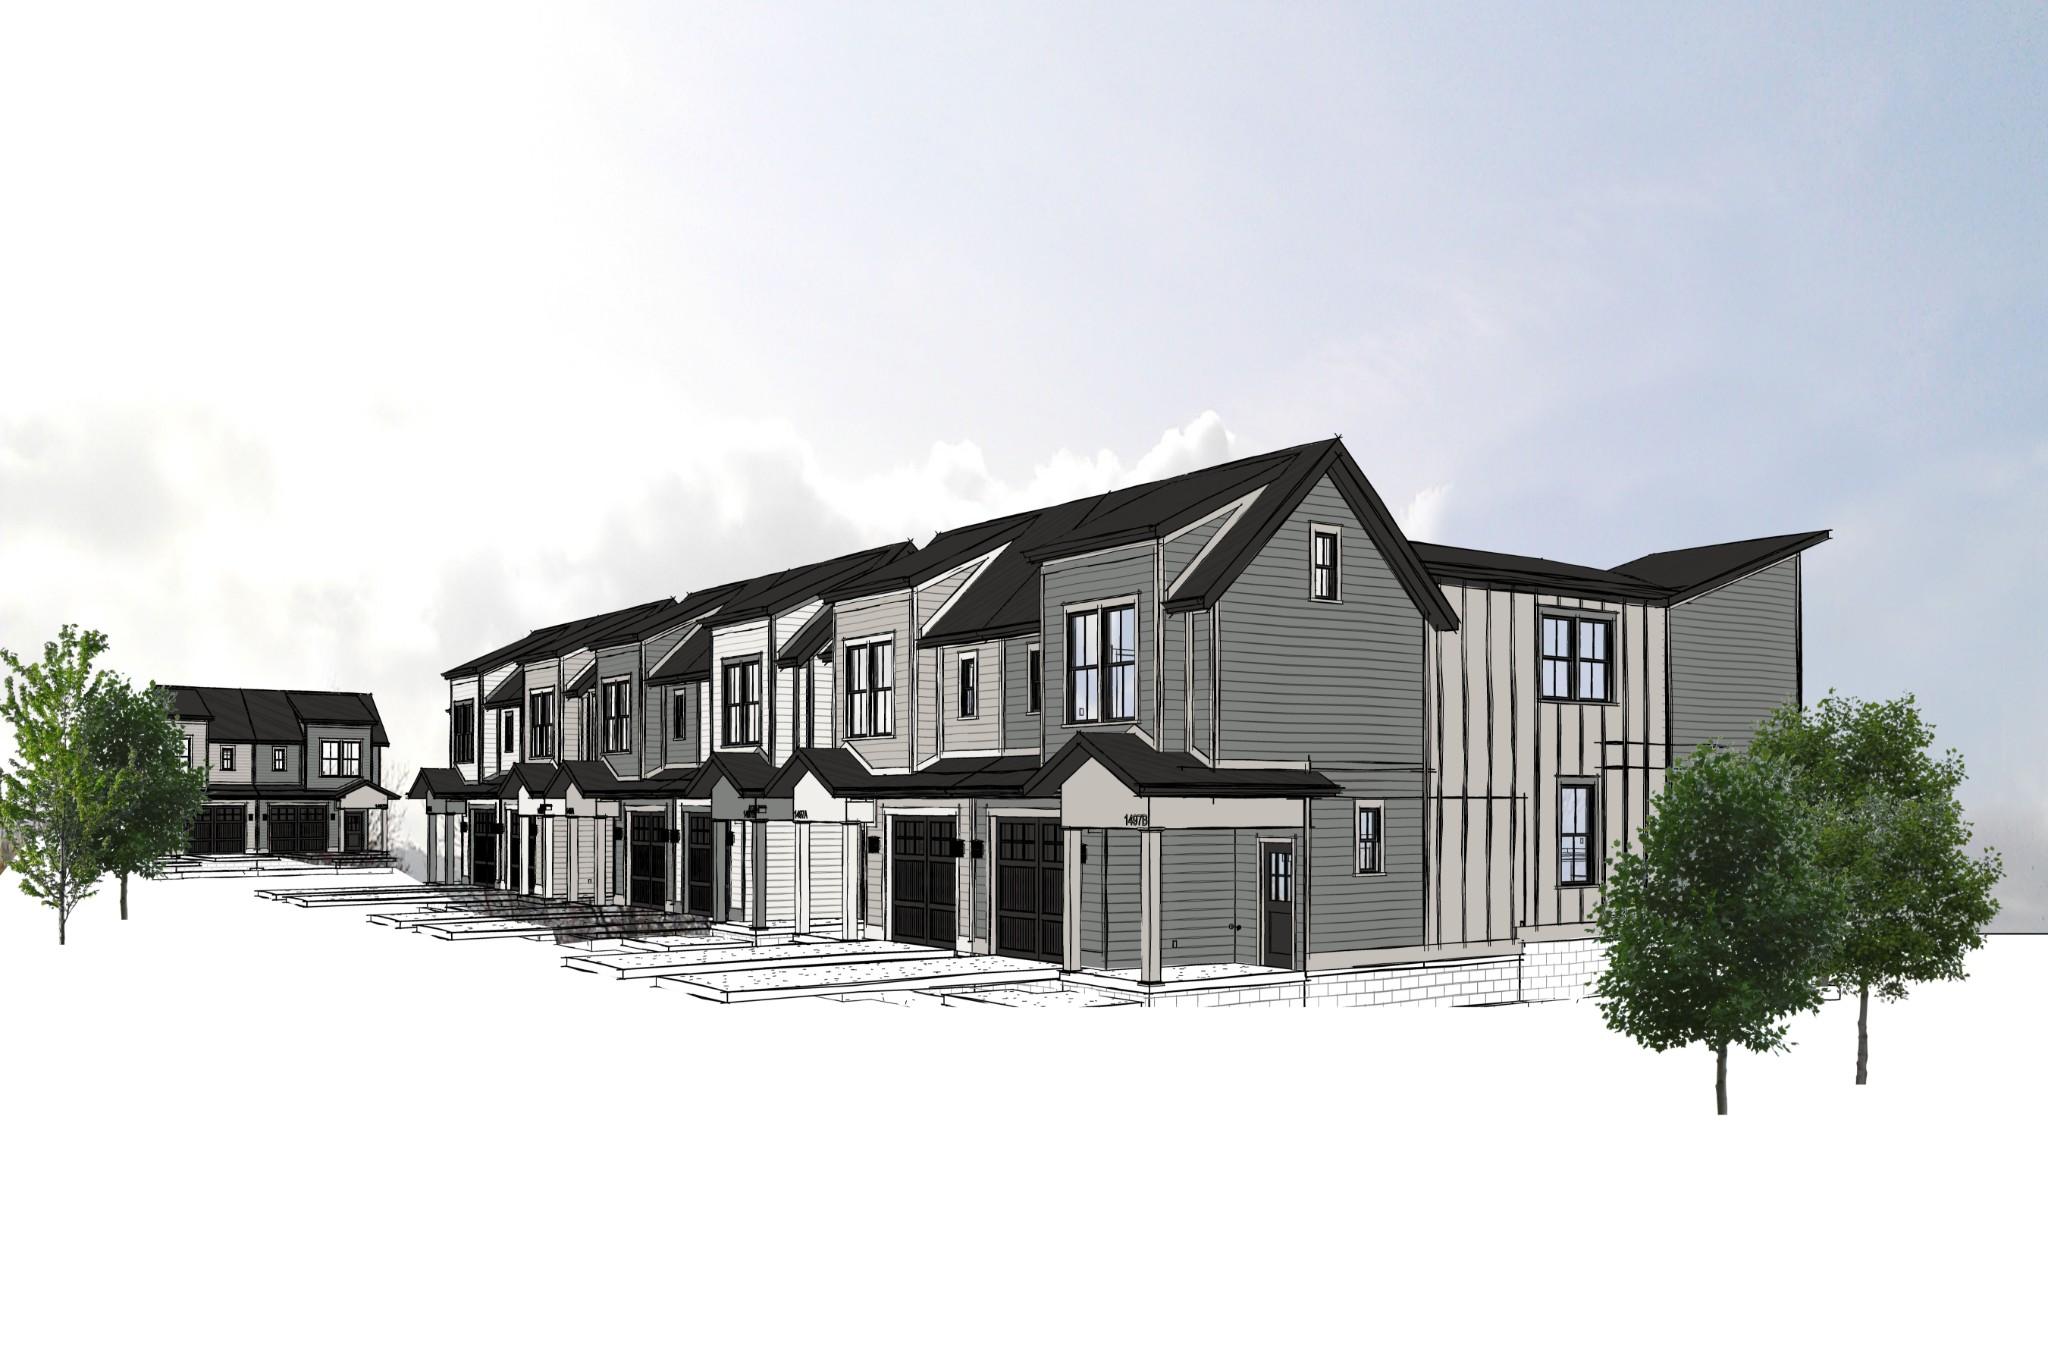 2101 Chadwell Retreat Dr, Madison, TN 37115 - Madison, TN real estate listing